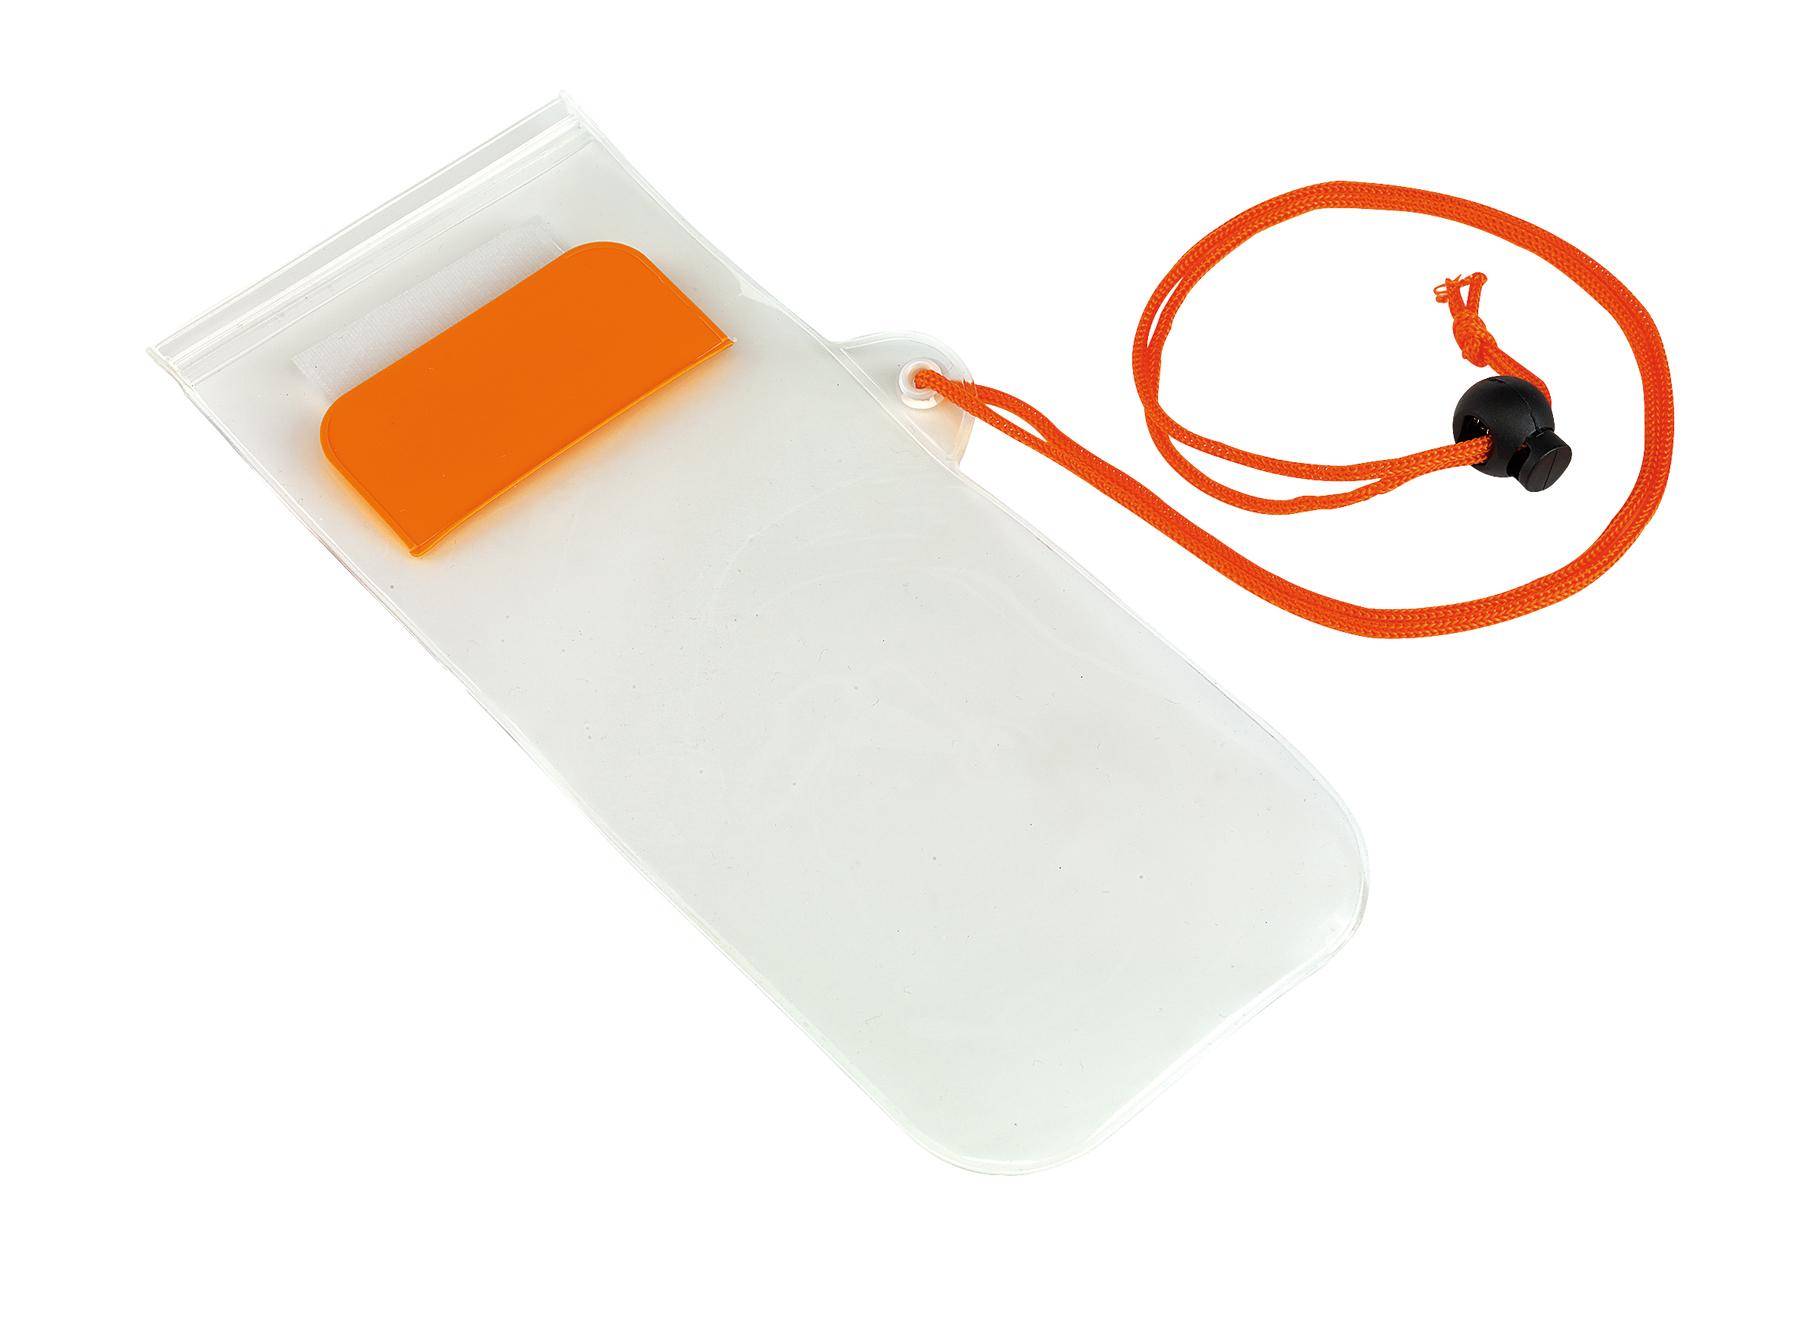 Torebka na telefon SMART SPLASH, pomarańczowy